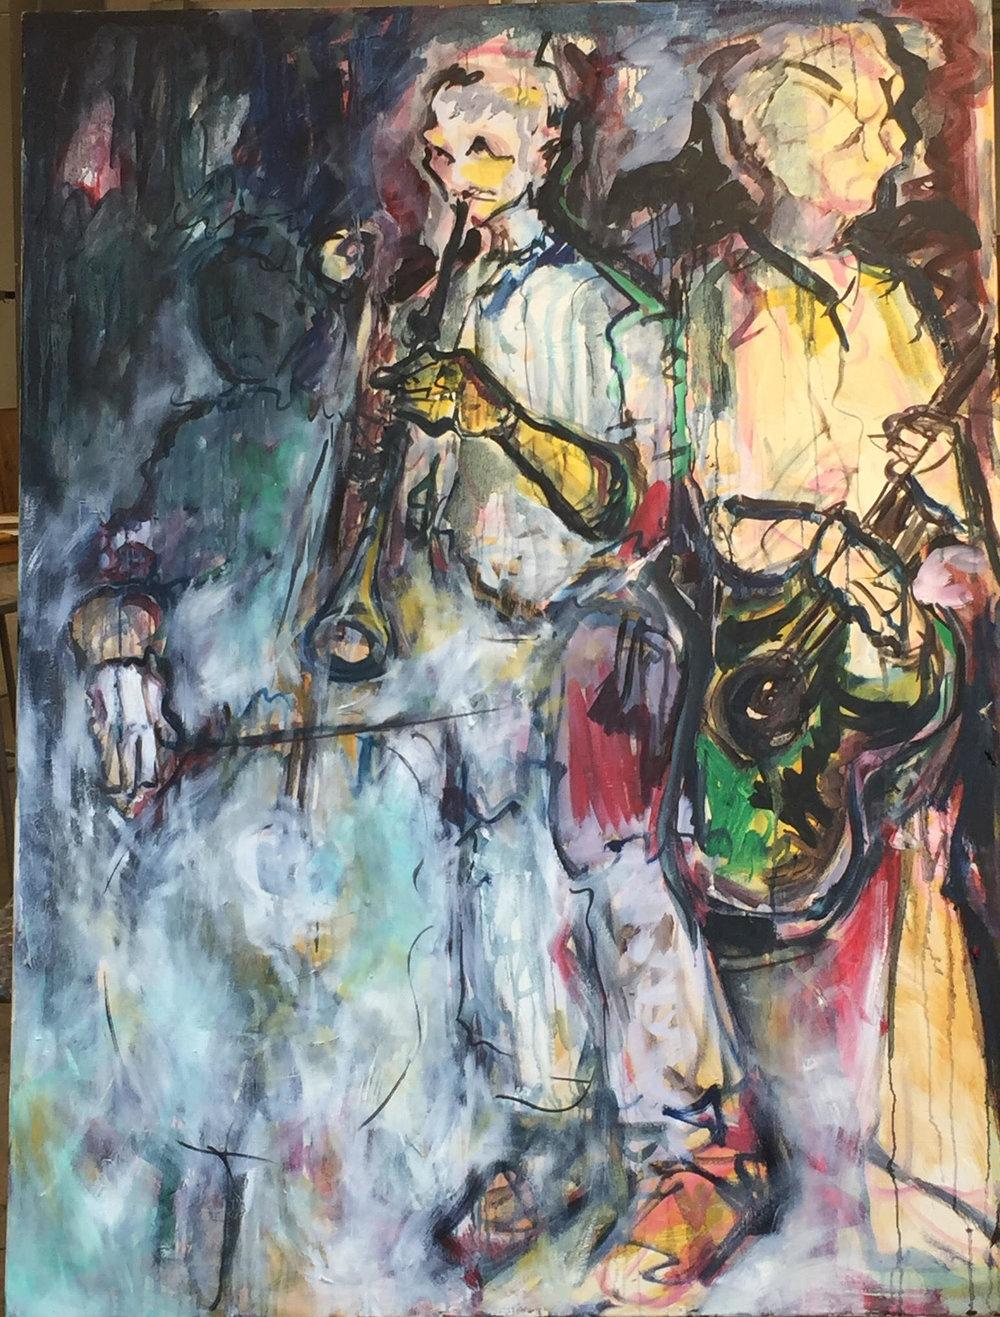 Foundry Gallery-Barbara Pliskin-The Group-48x36-Oil on canvas-2018-$2500.jpg